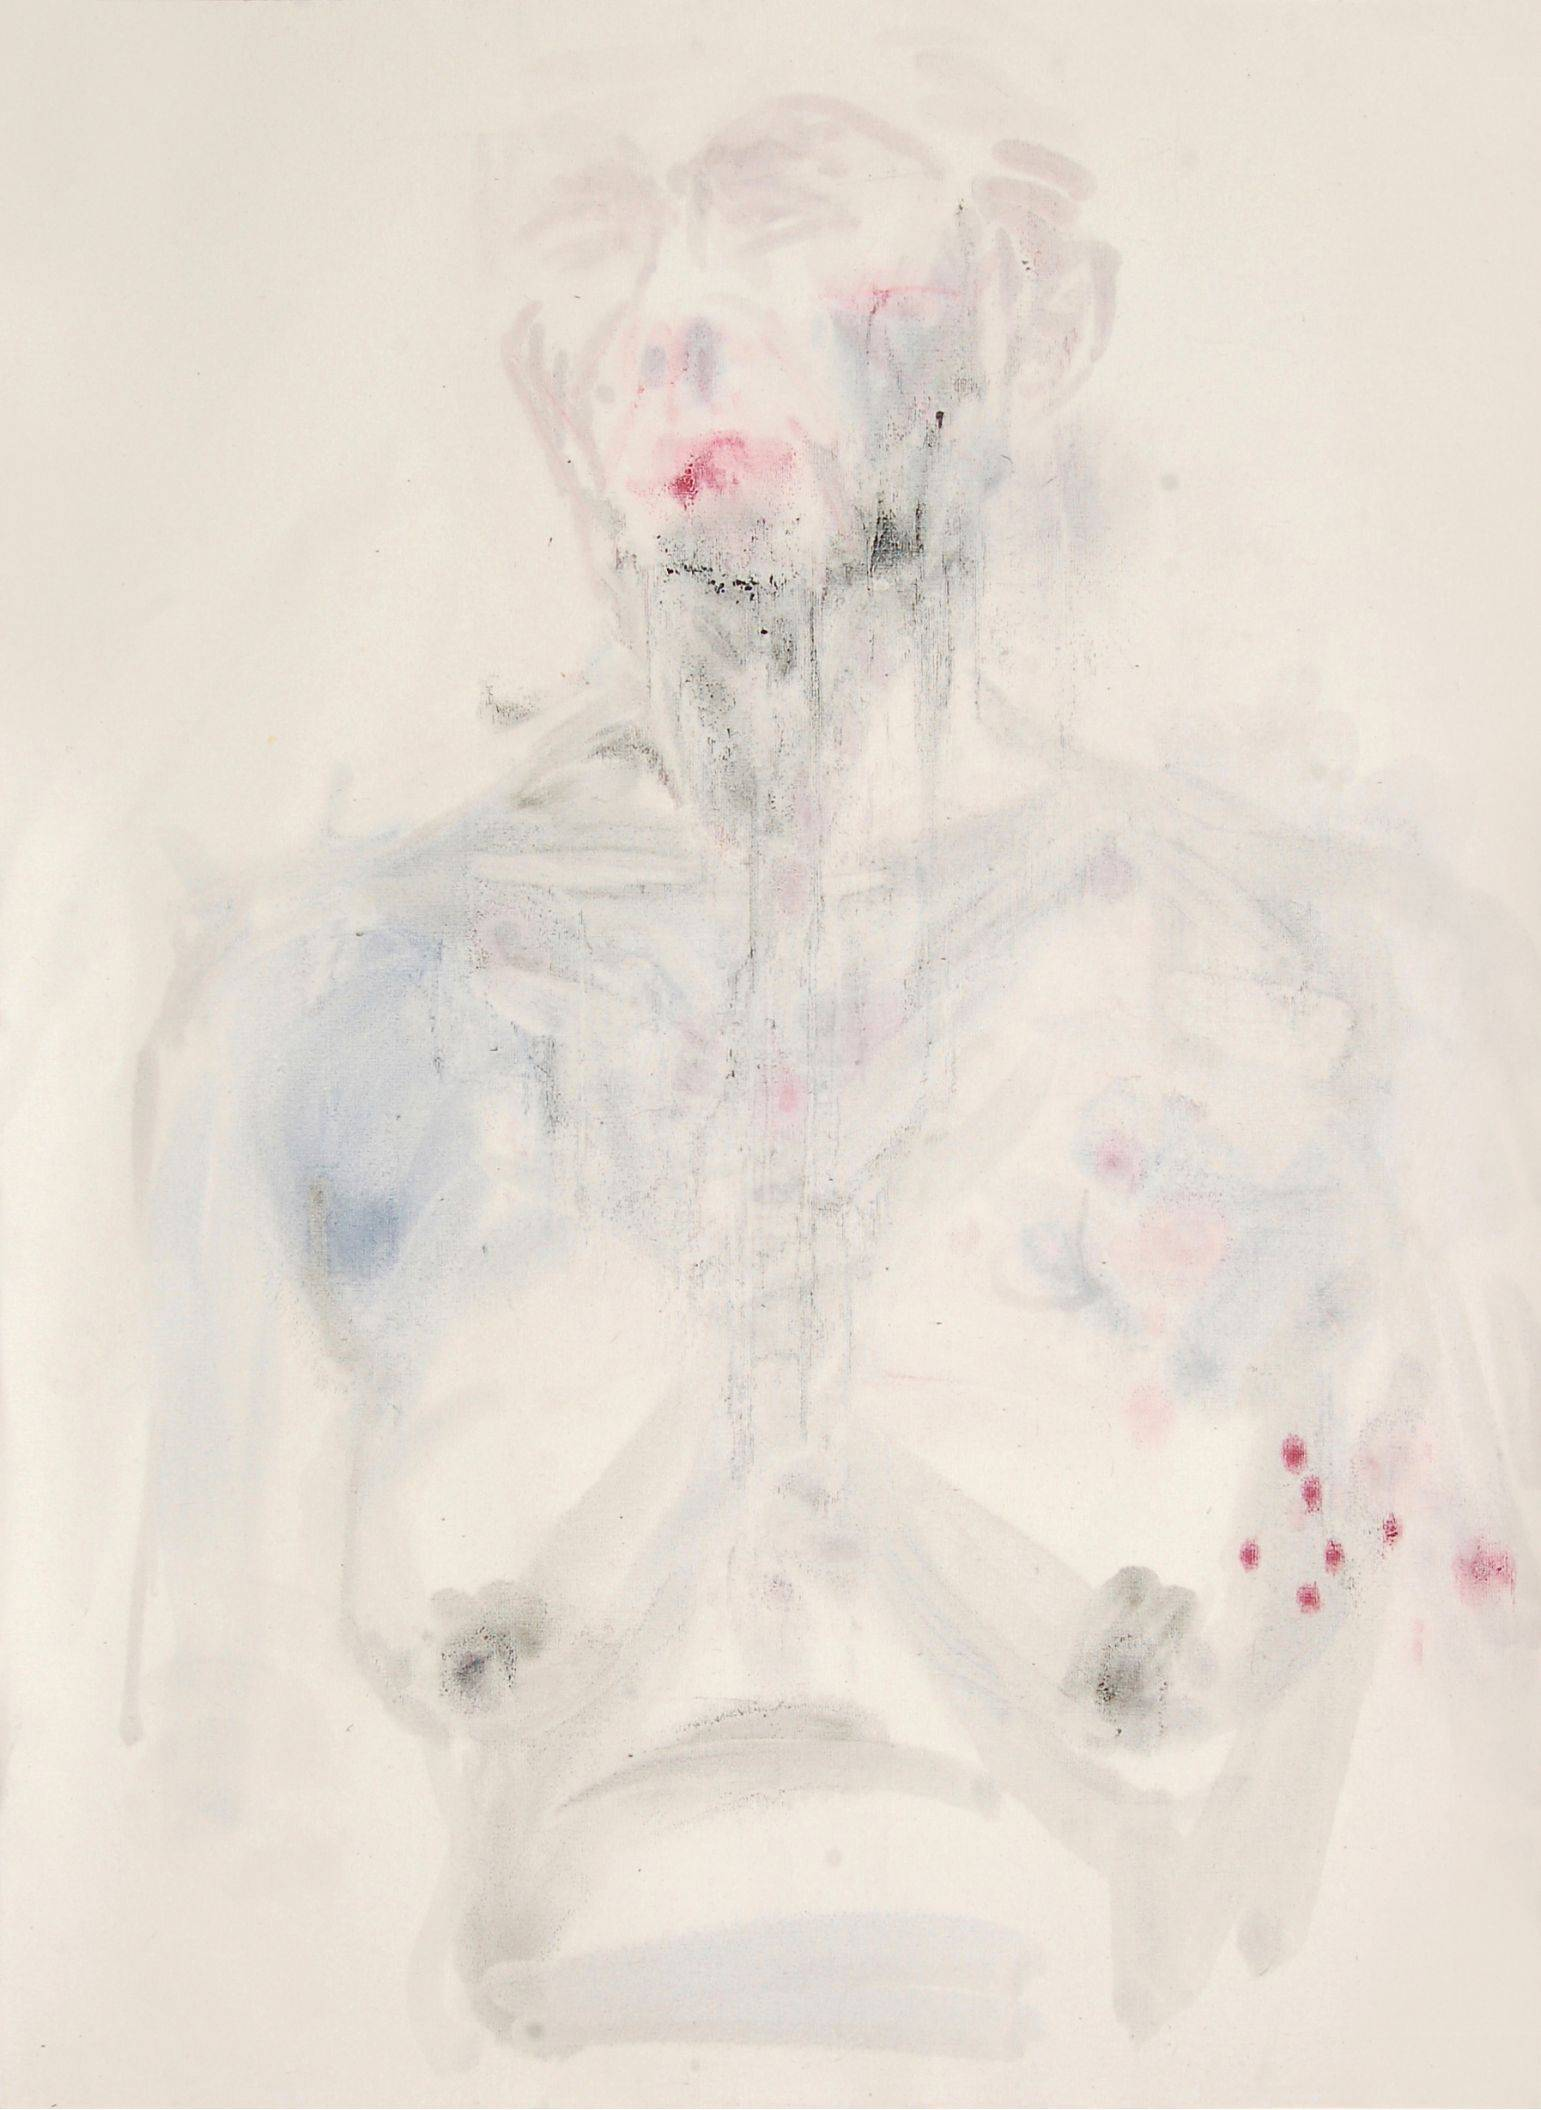 Study for Portrait of Vantana No. 3